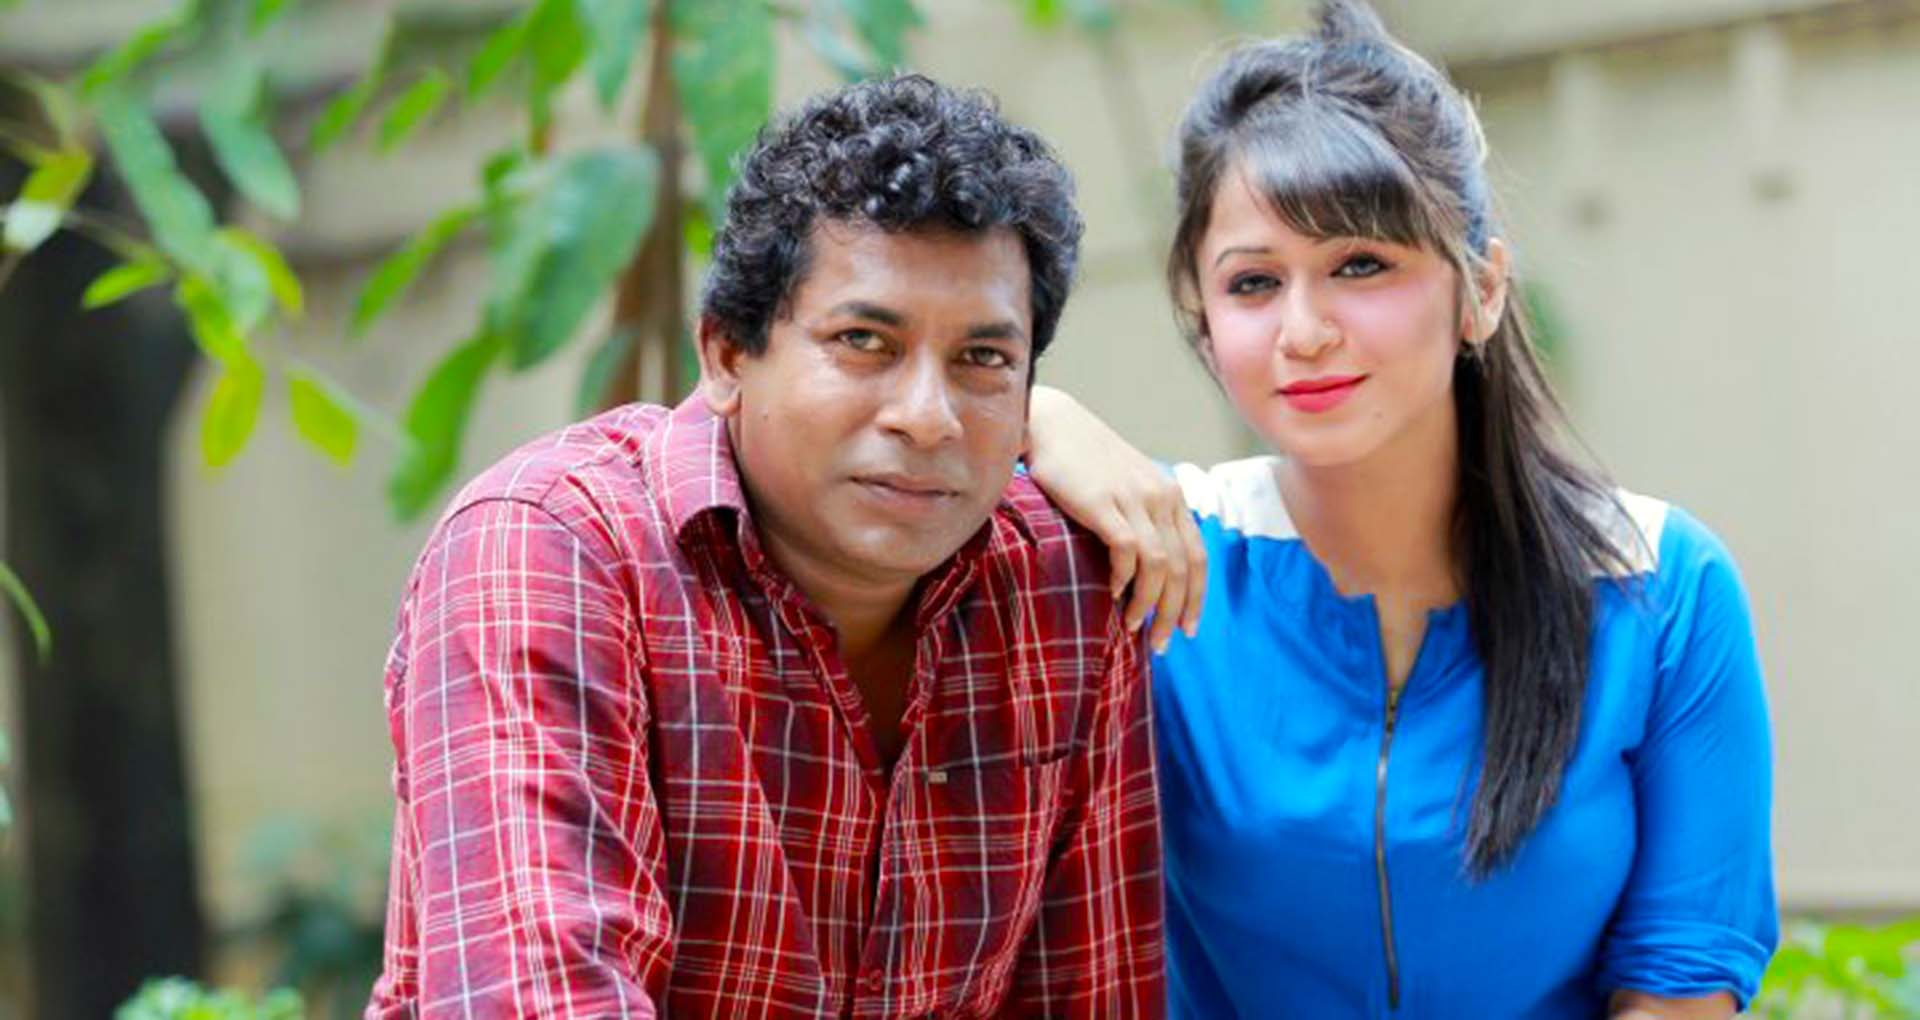 Photo of আবার 'যমজ' নাটকে নতুন লুকে মোশাররফ, সঙ্গে আছেন ফারিয়াও